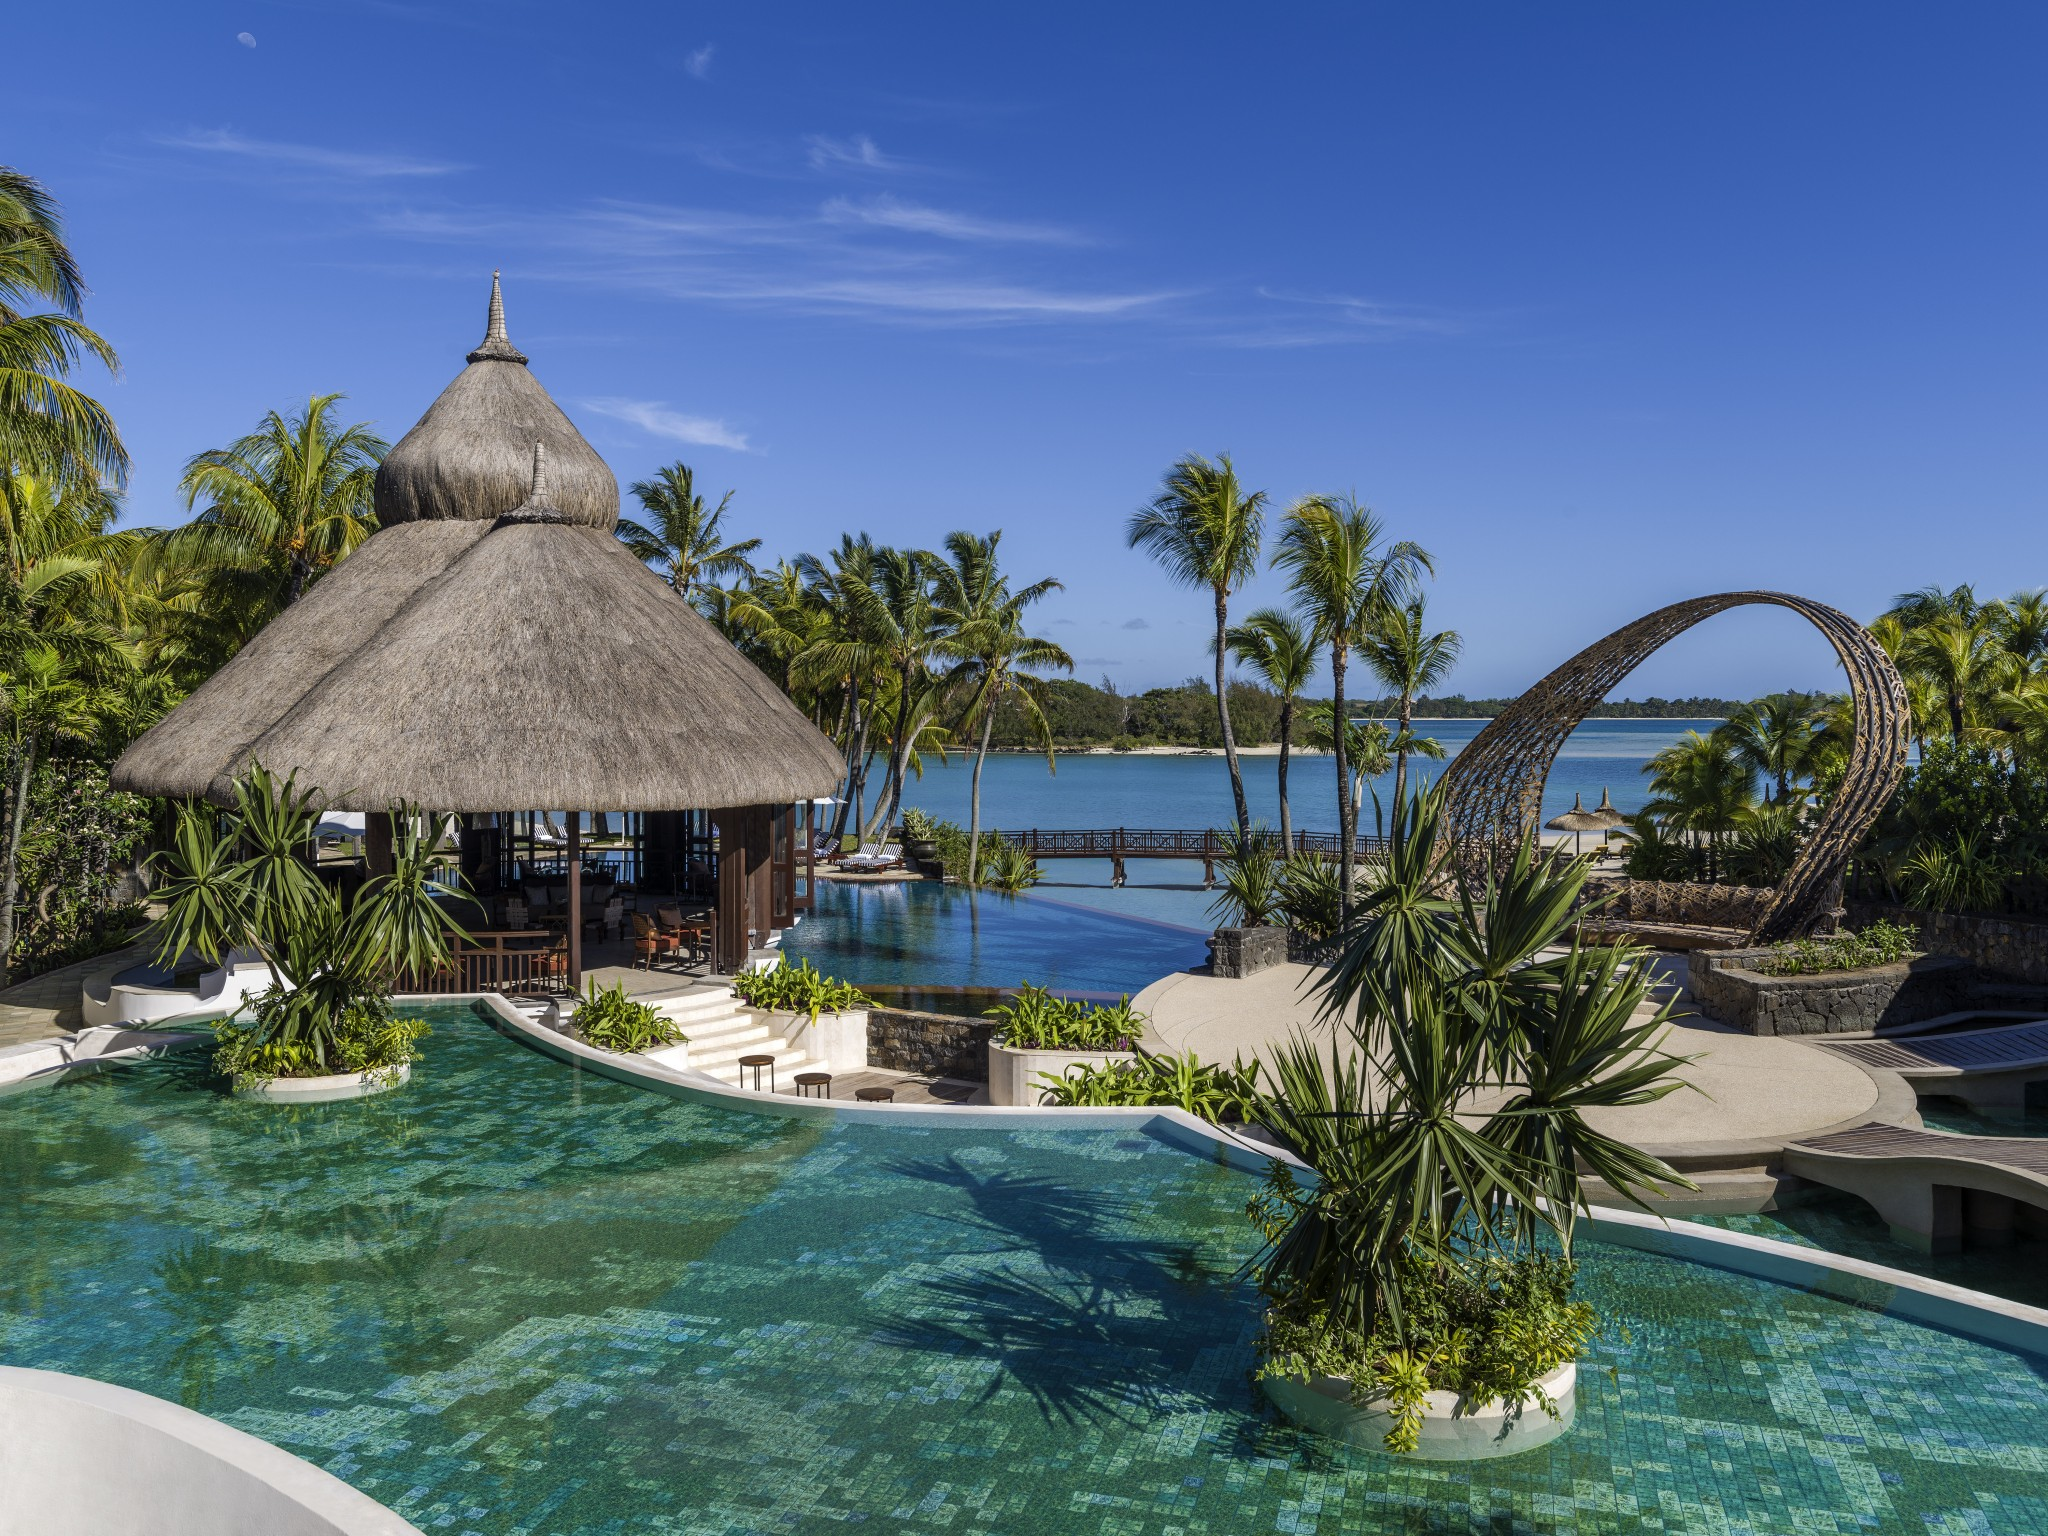 Ideal für einen Familien-Urlaub: Shangri-La's Le Touessrok Resort & Spa auf Mauritius.